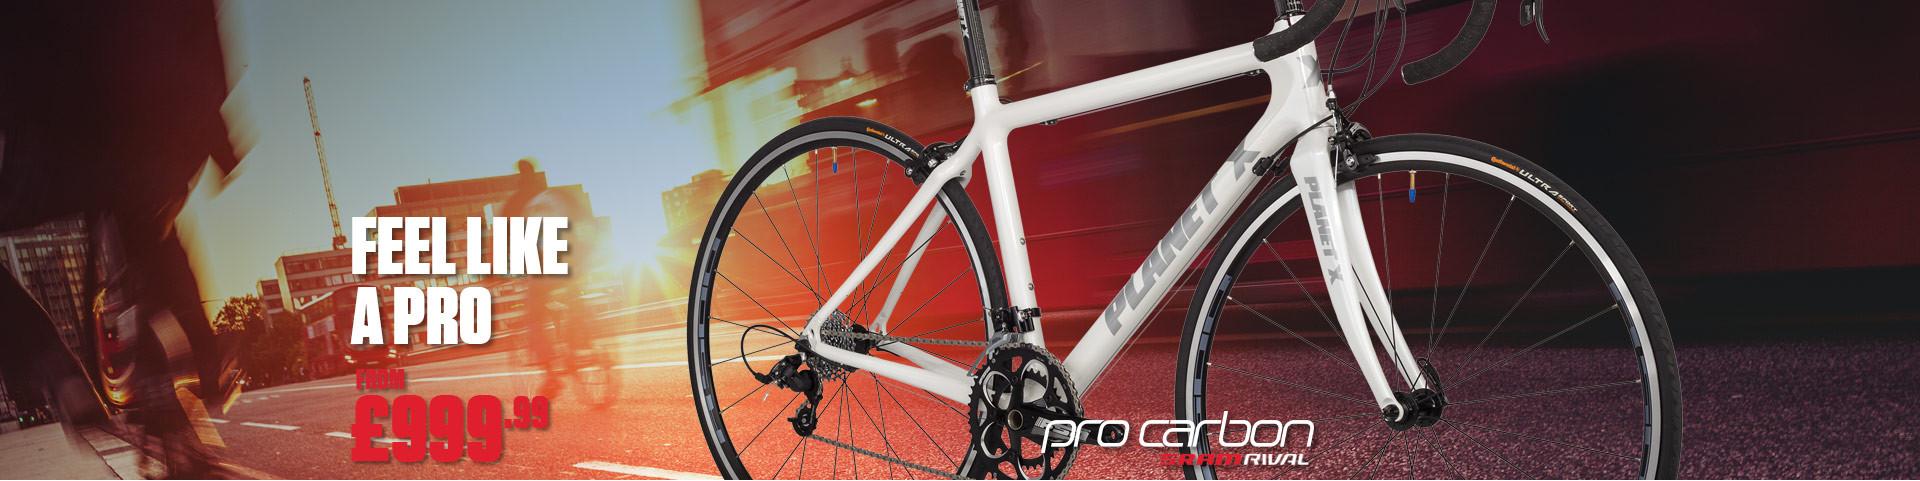 Planet X Pro Carbon SRAM Rival Road Bike